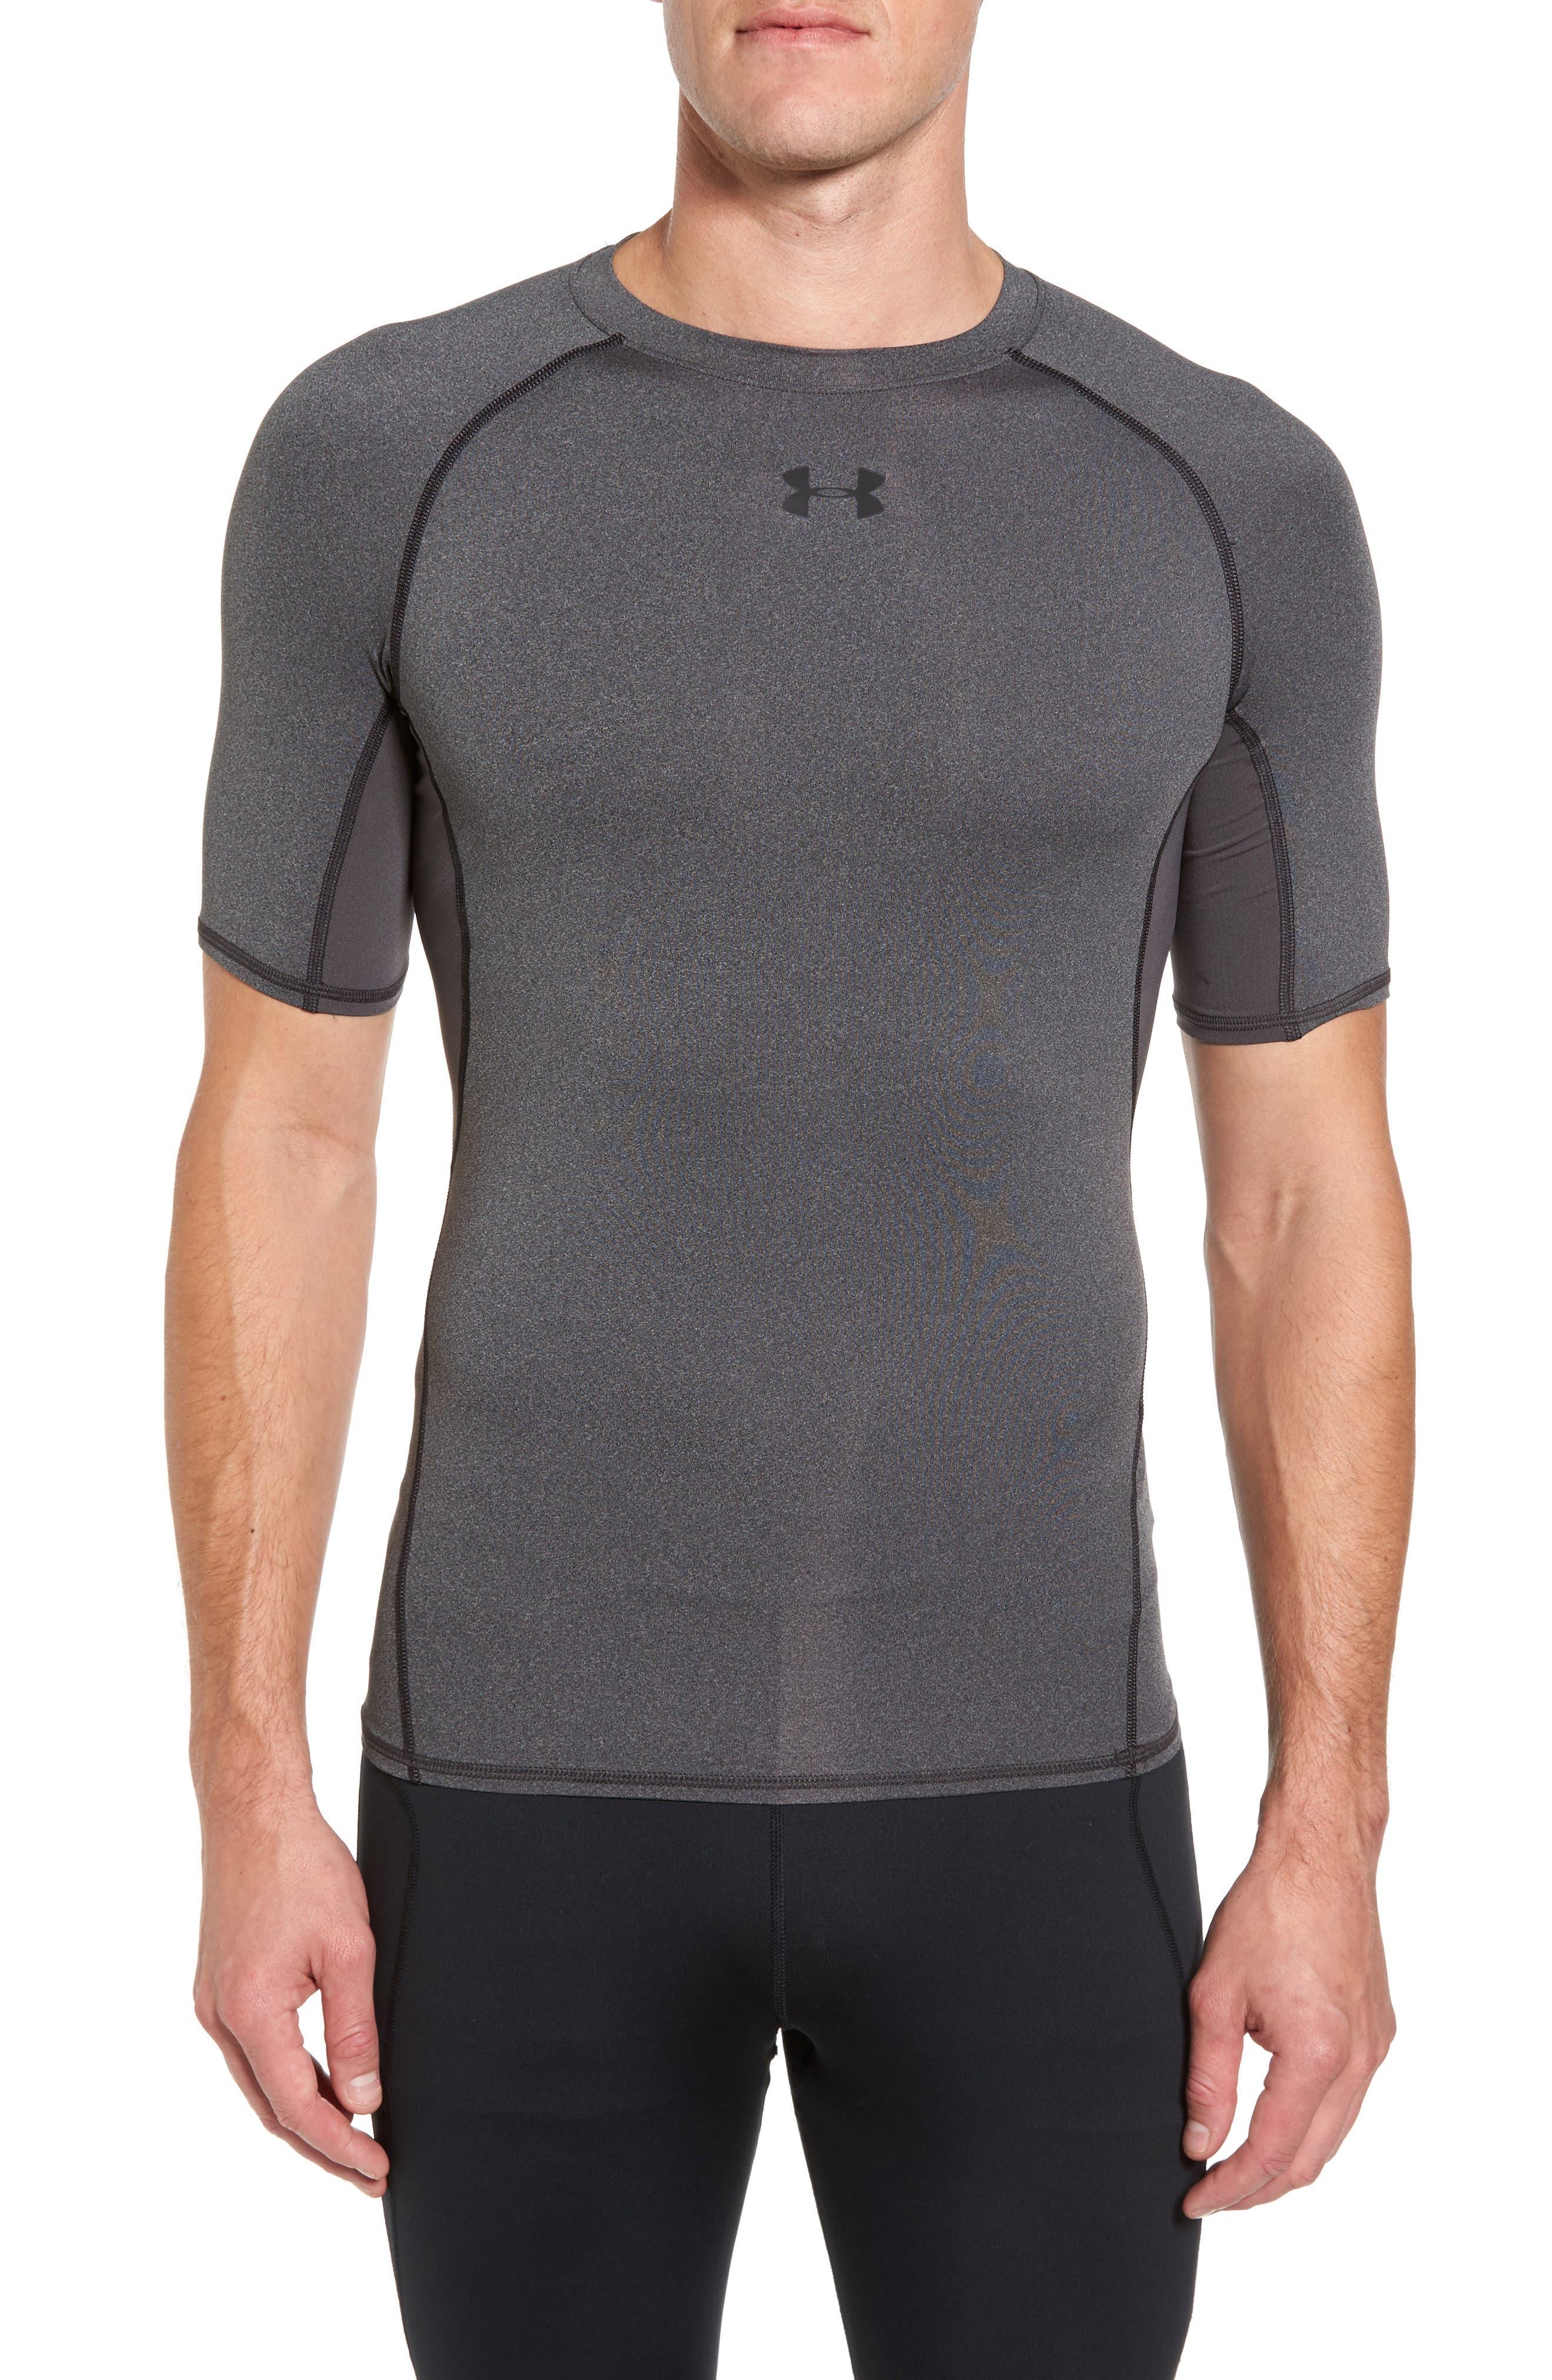 HeatGear<sup>®</sup> Compression Fit T-Shirt,                         Main,                         color, CARBON HEATHER/ BLACK